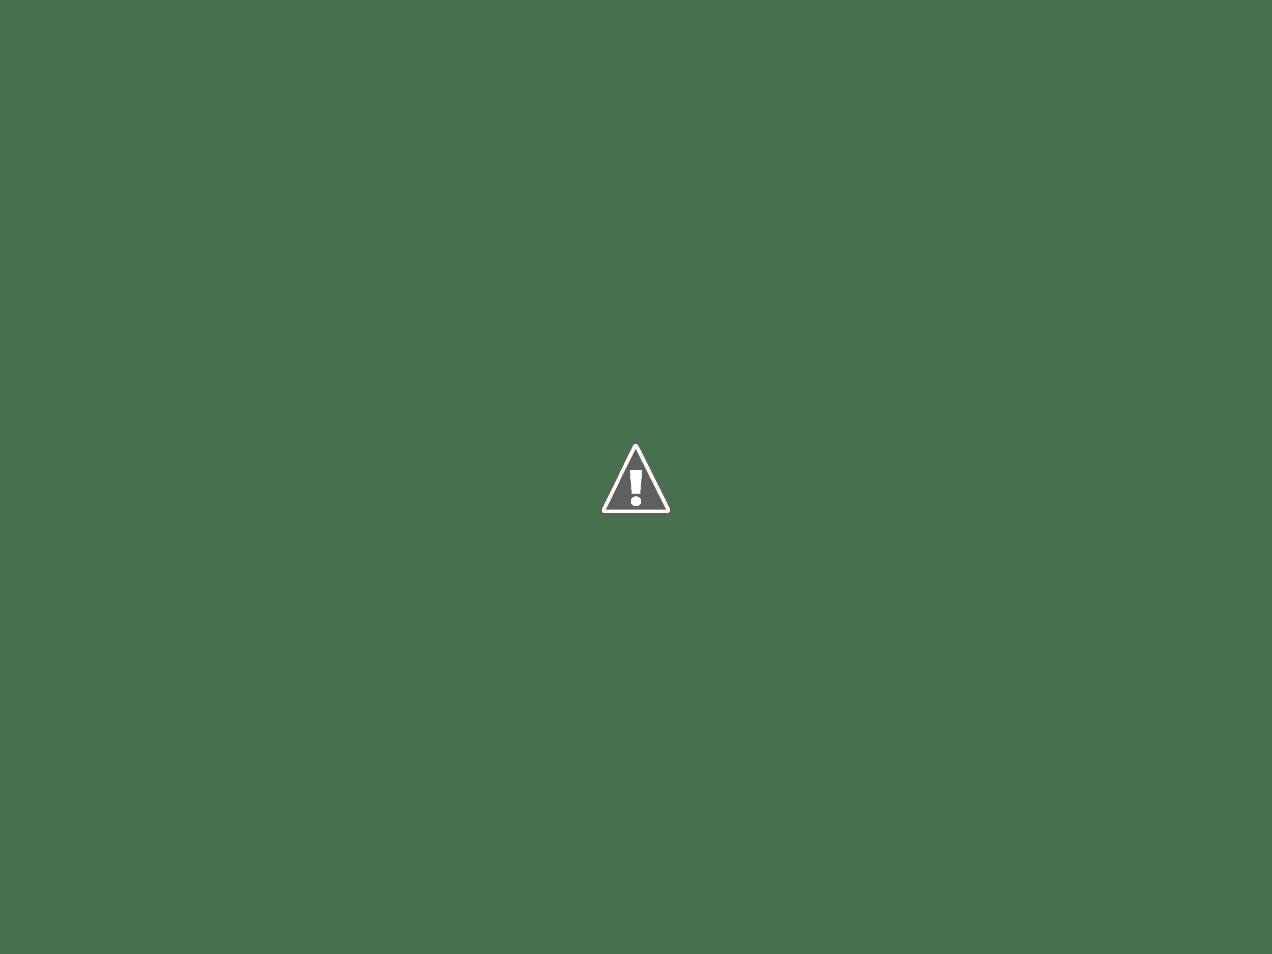 Maxillaria tenuifolia - Page 3 LwpYff7P-R3vxSQc6cLnFlhoay6_RDxHUwXQWzGRzlLFkExFY09ke7vhwXXoaYyX35rxLwJnPO_uOQtPvxMMb-pZpyrPIS1OT3hN1vFFZD5uOLIv7IyTlDml-nl8vmvD5rYzmcrDwHTFG-5p14ZKTvpg5mvOLxGn8X4ri9hXvAtXlHyYReQyeKWXUmlhQ2gmPb4kKvW_fpV_diaBsyNVIRUXlFQSXE1Bo7rae4FRuDKu8TnyQxrVkOsb0QInKDlAD3A1oip3gNYBJIdmWyrmAkll_OA32wradwAwP3V1p4GReo6-7TzPwtyDobII7sjEBs5cpYPzPHlQ28LQIBArtQv6T72oqEYcjKlRf4SqJdDKTSWr_TsxNxuLaGO7wMzO1hy922h6YABU03lL6DREBS0_f2TImxHoaz9zRs4x73Rft7F0ESx-Jw40NY4ENfkaNYpnQr2ny_8-gWLRjLwZkgz5Fs1C1J07JjAEXwTdxAYl2TAsL2rxwDMjfLBk9odsdMC5oUQSWb6GVoCgBTqS2CEopsytXXyN0j__IRPryRYIVGP0EYM5Tgv7ixspgiab9HlNfo7ZzpI_1qU8VR76M3dAy-NWFYlAJ1PxEXZpSd02yMVLp3xAlswm6njvV1f7WFoZEJC5M5CbswL6qxKGxCWB6e3aru0=w1272-h954-no